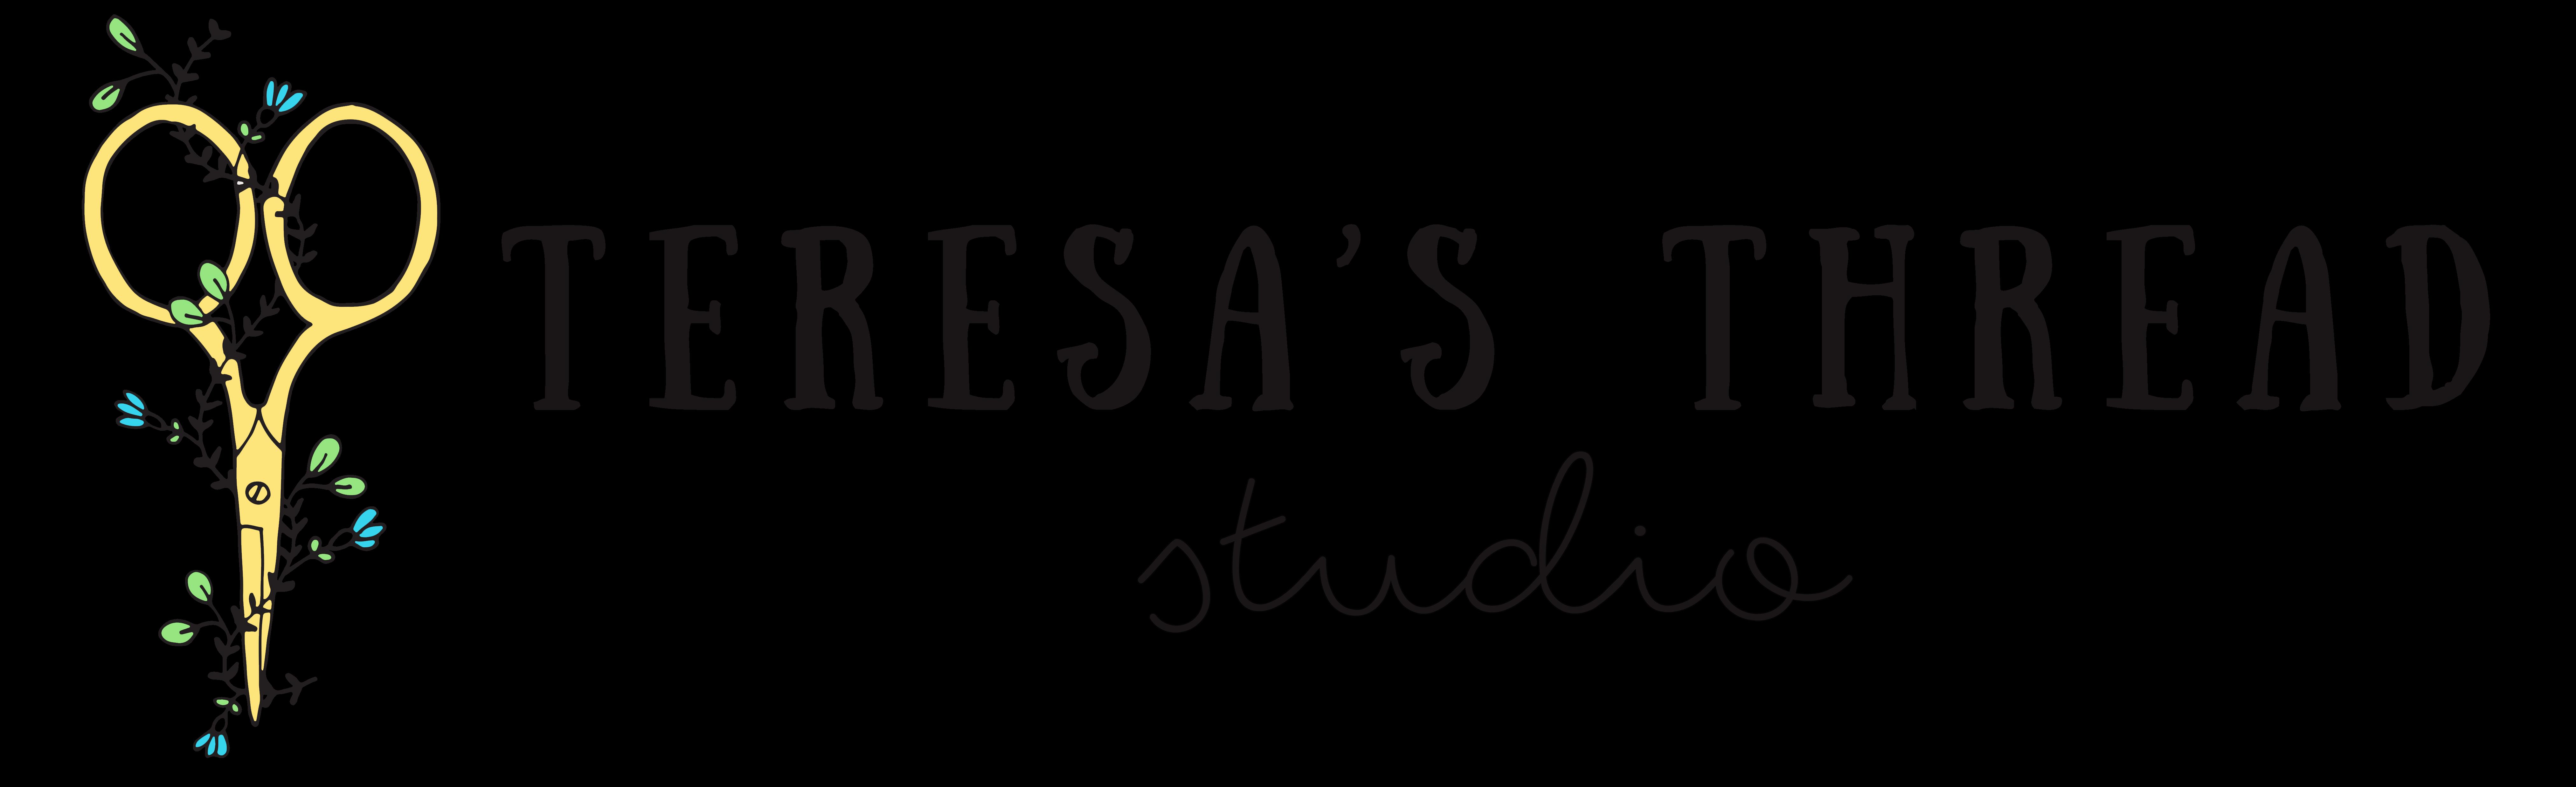 Teresa's Thread Studio